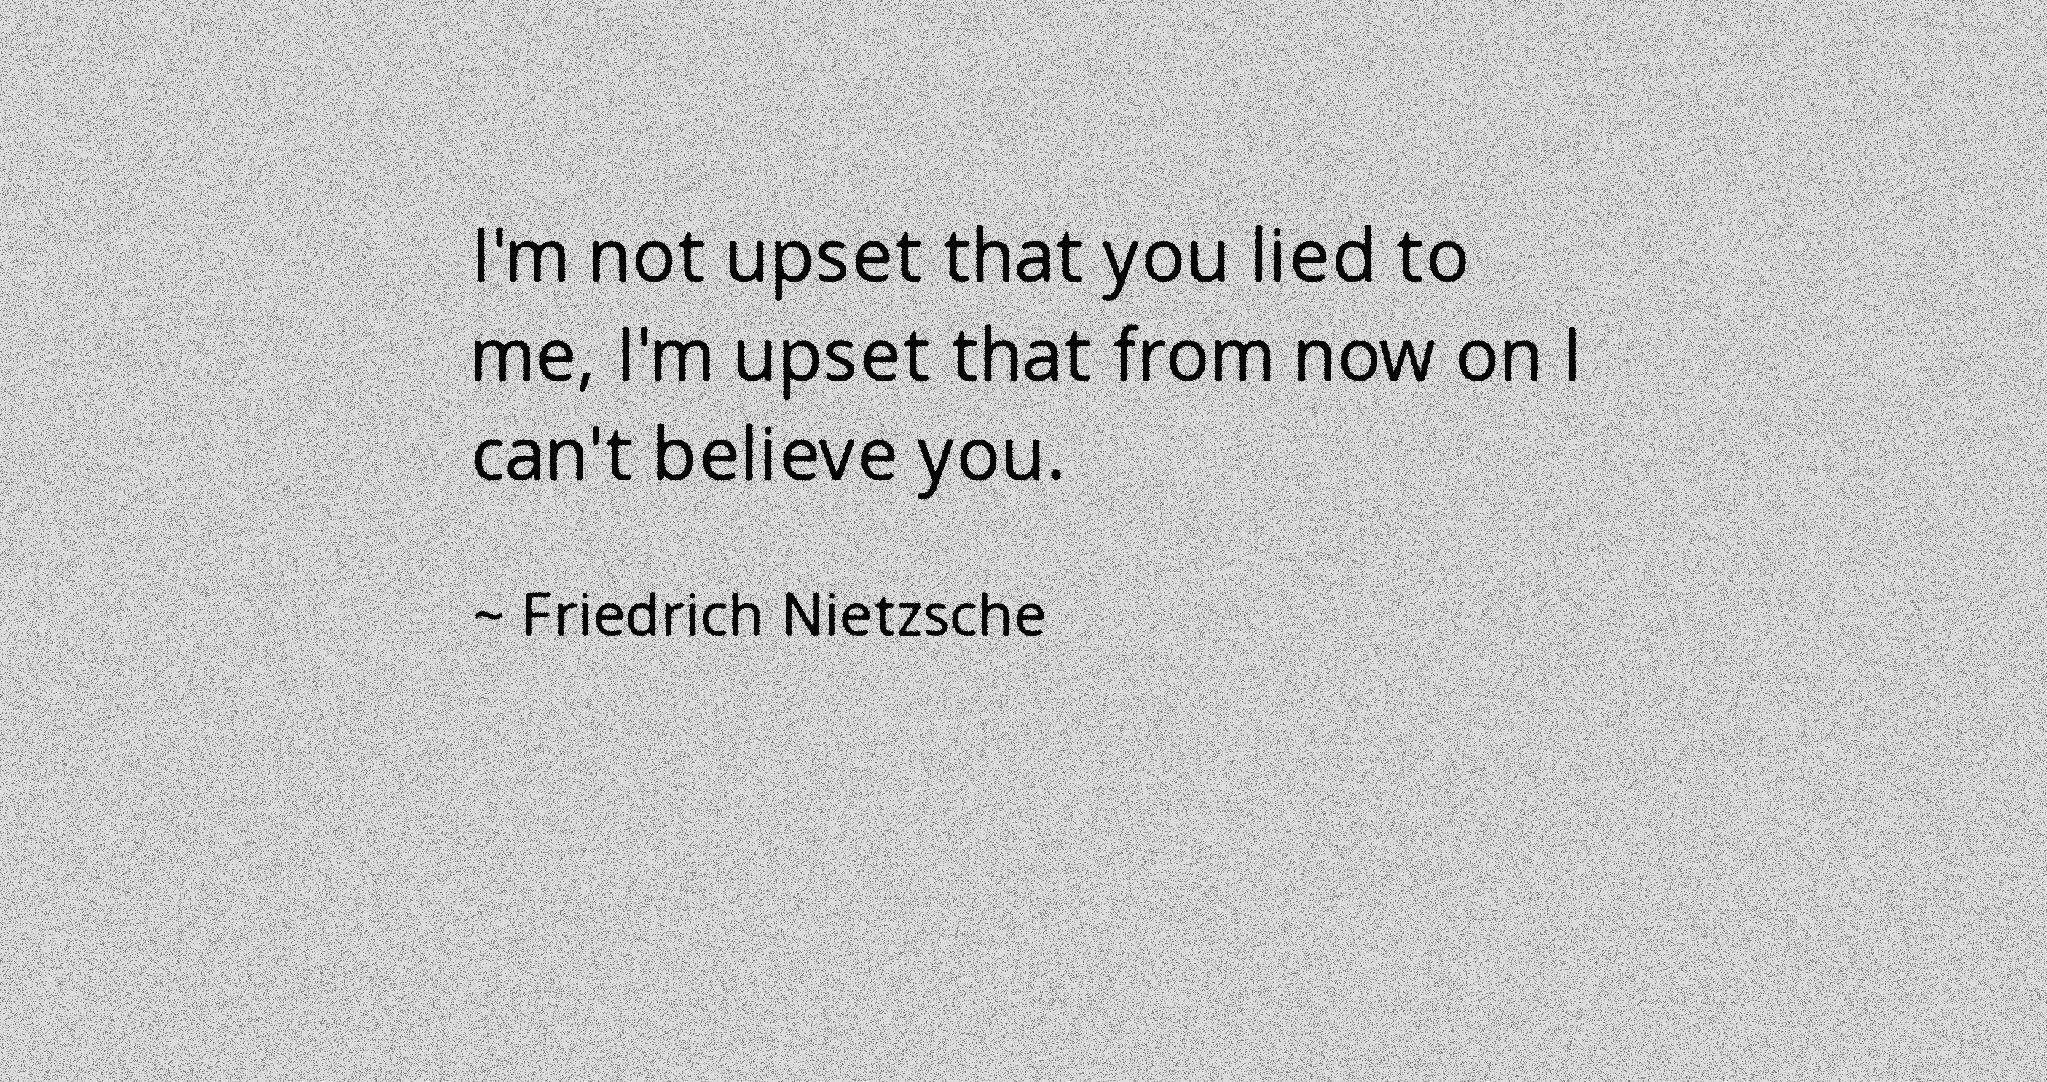 Nietzsche Quotes Friedrich Nietzsche  Words Of Wisdom  Pinterest  Friedrich